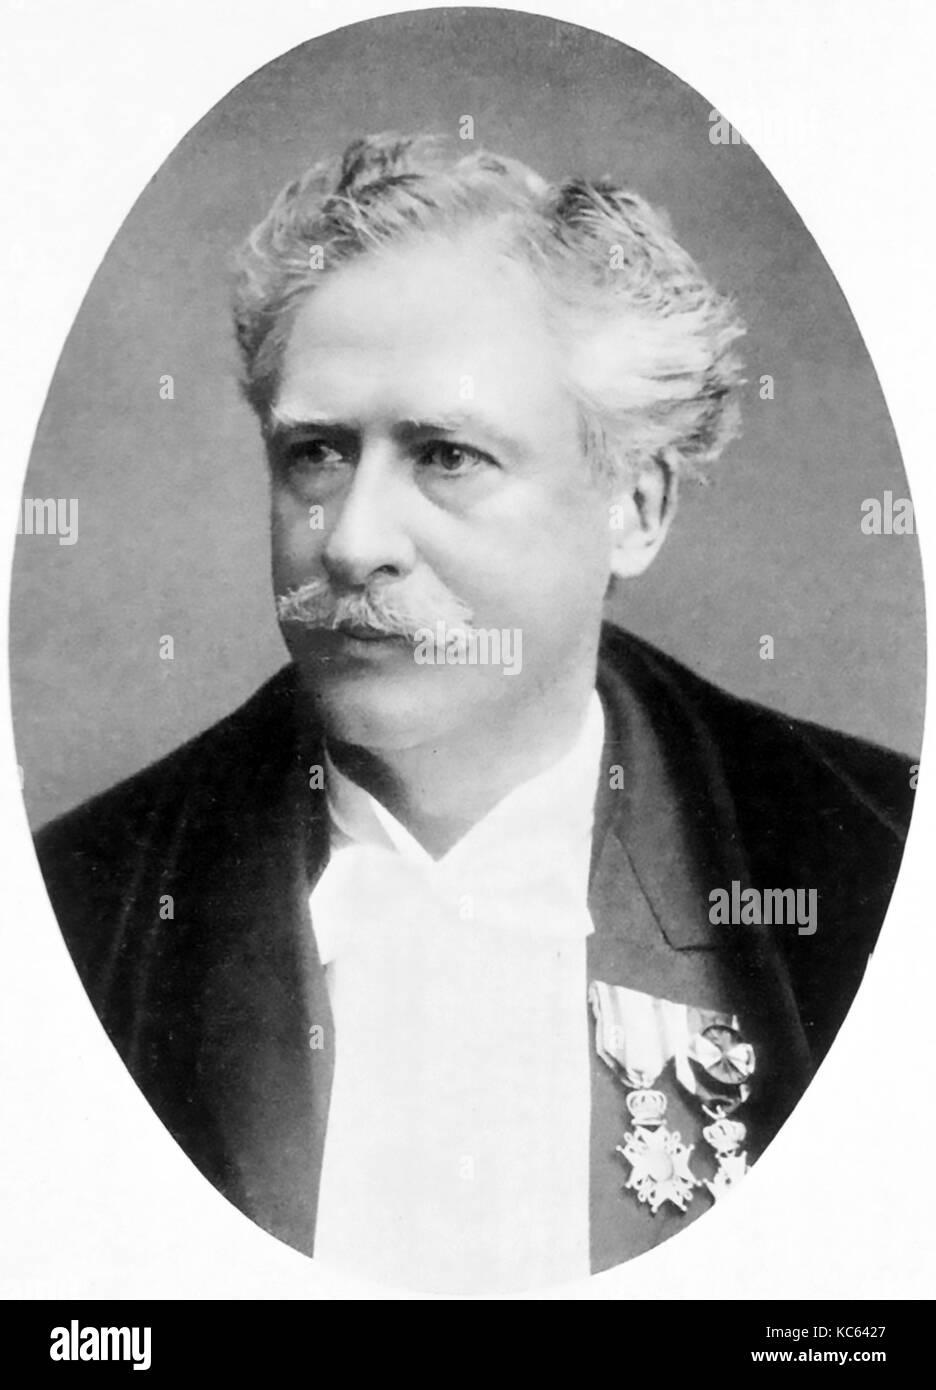 HERMAN SNELLEN (1834-1908) Dutch opthamologist - Stock Image